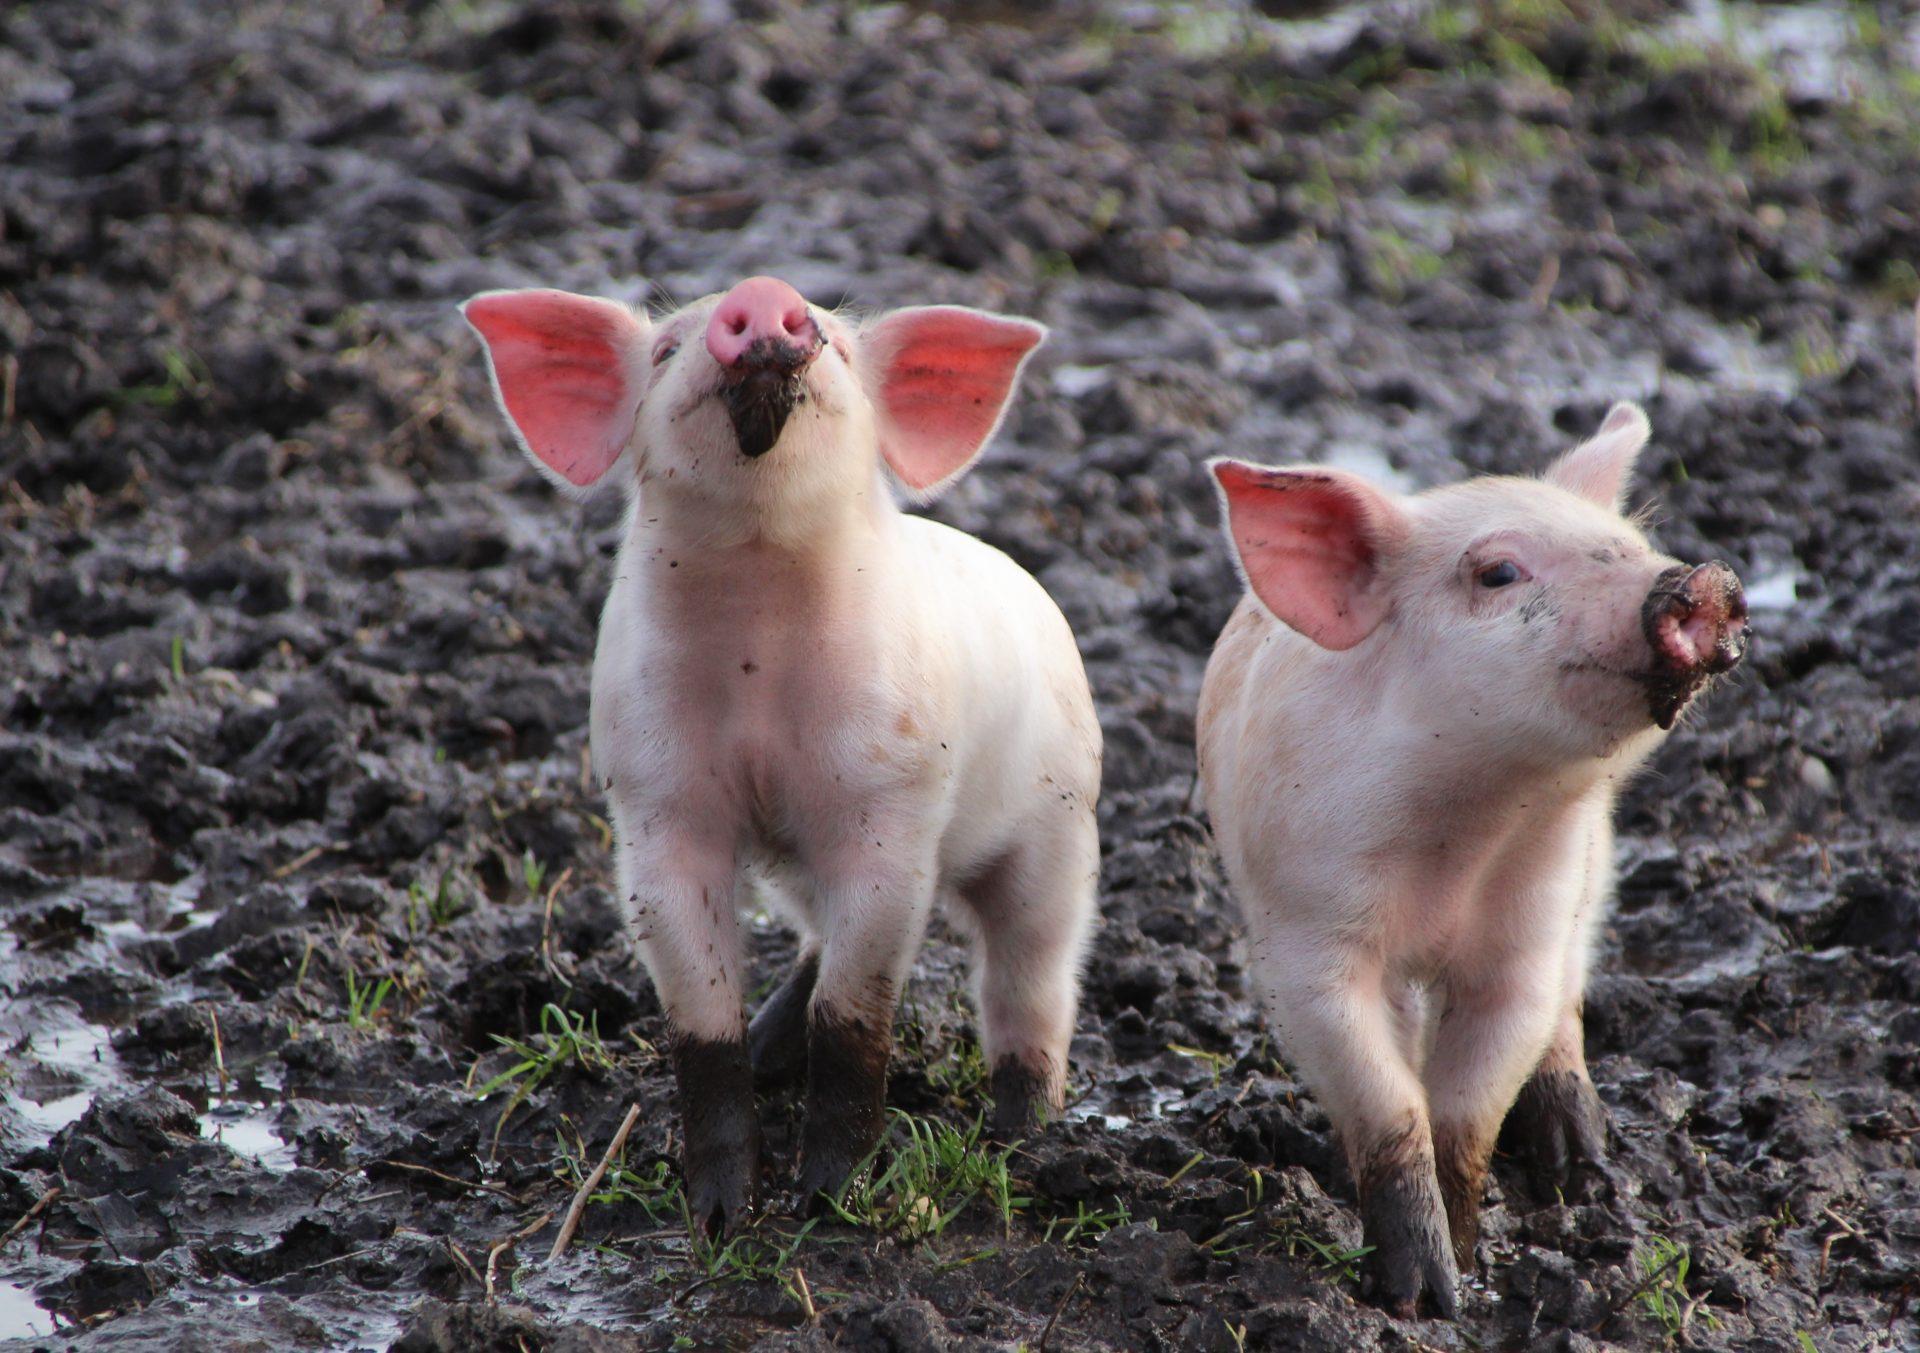 Små grise med mudder på trynen